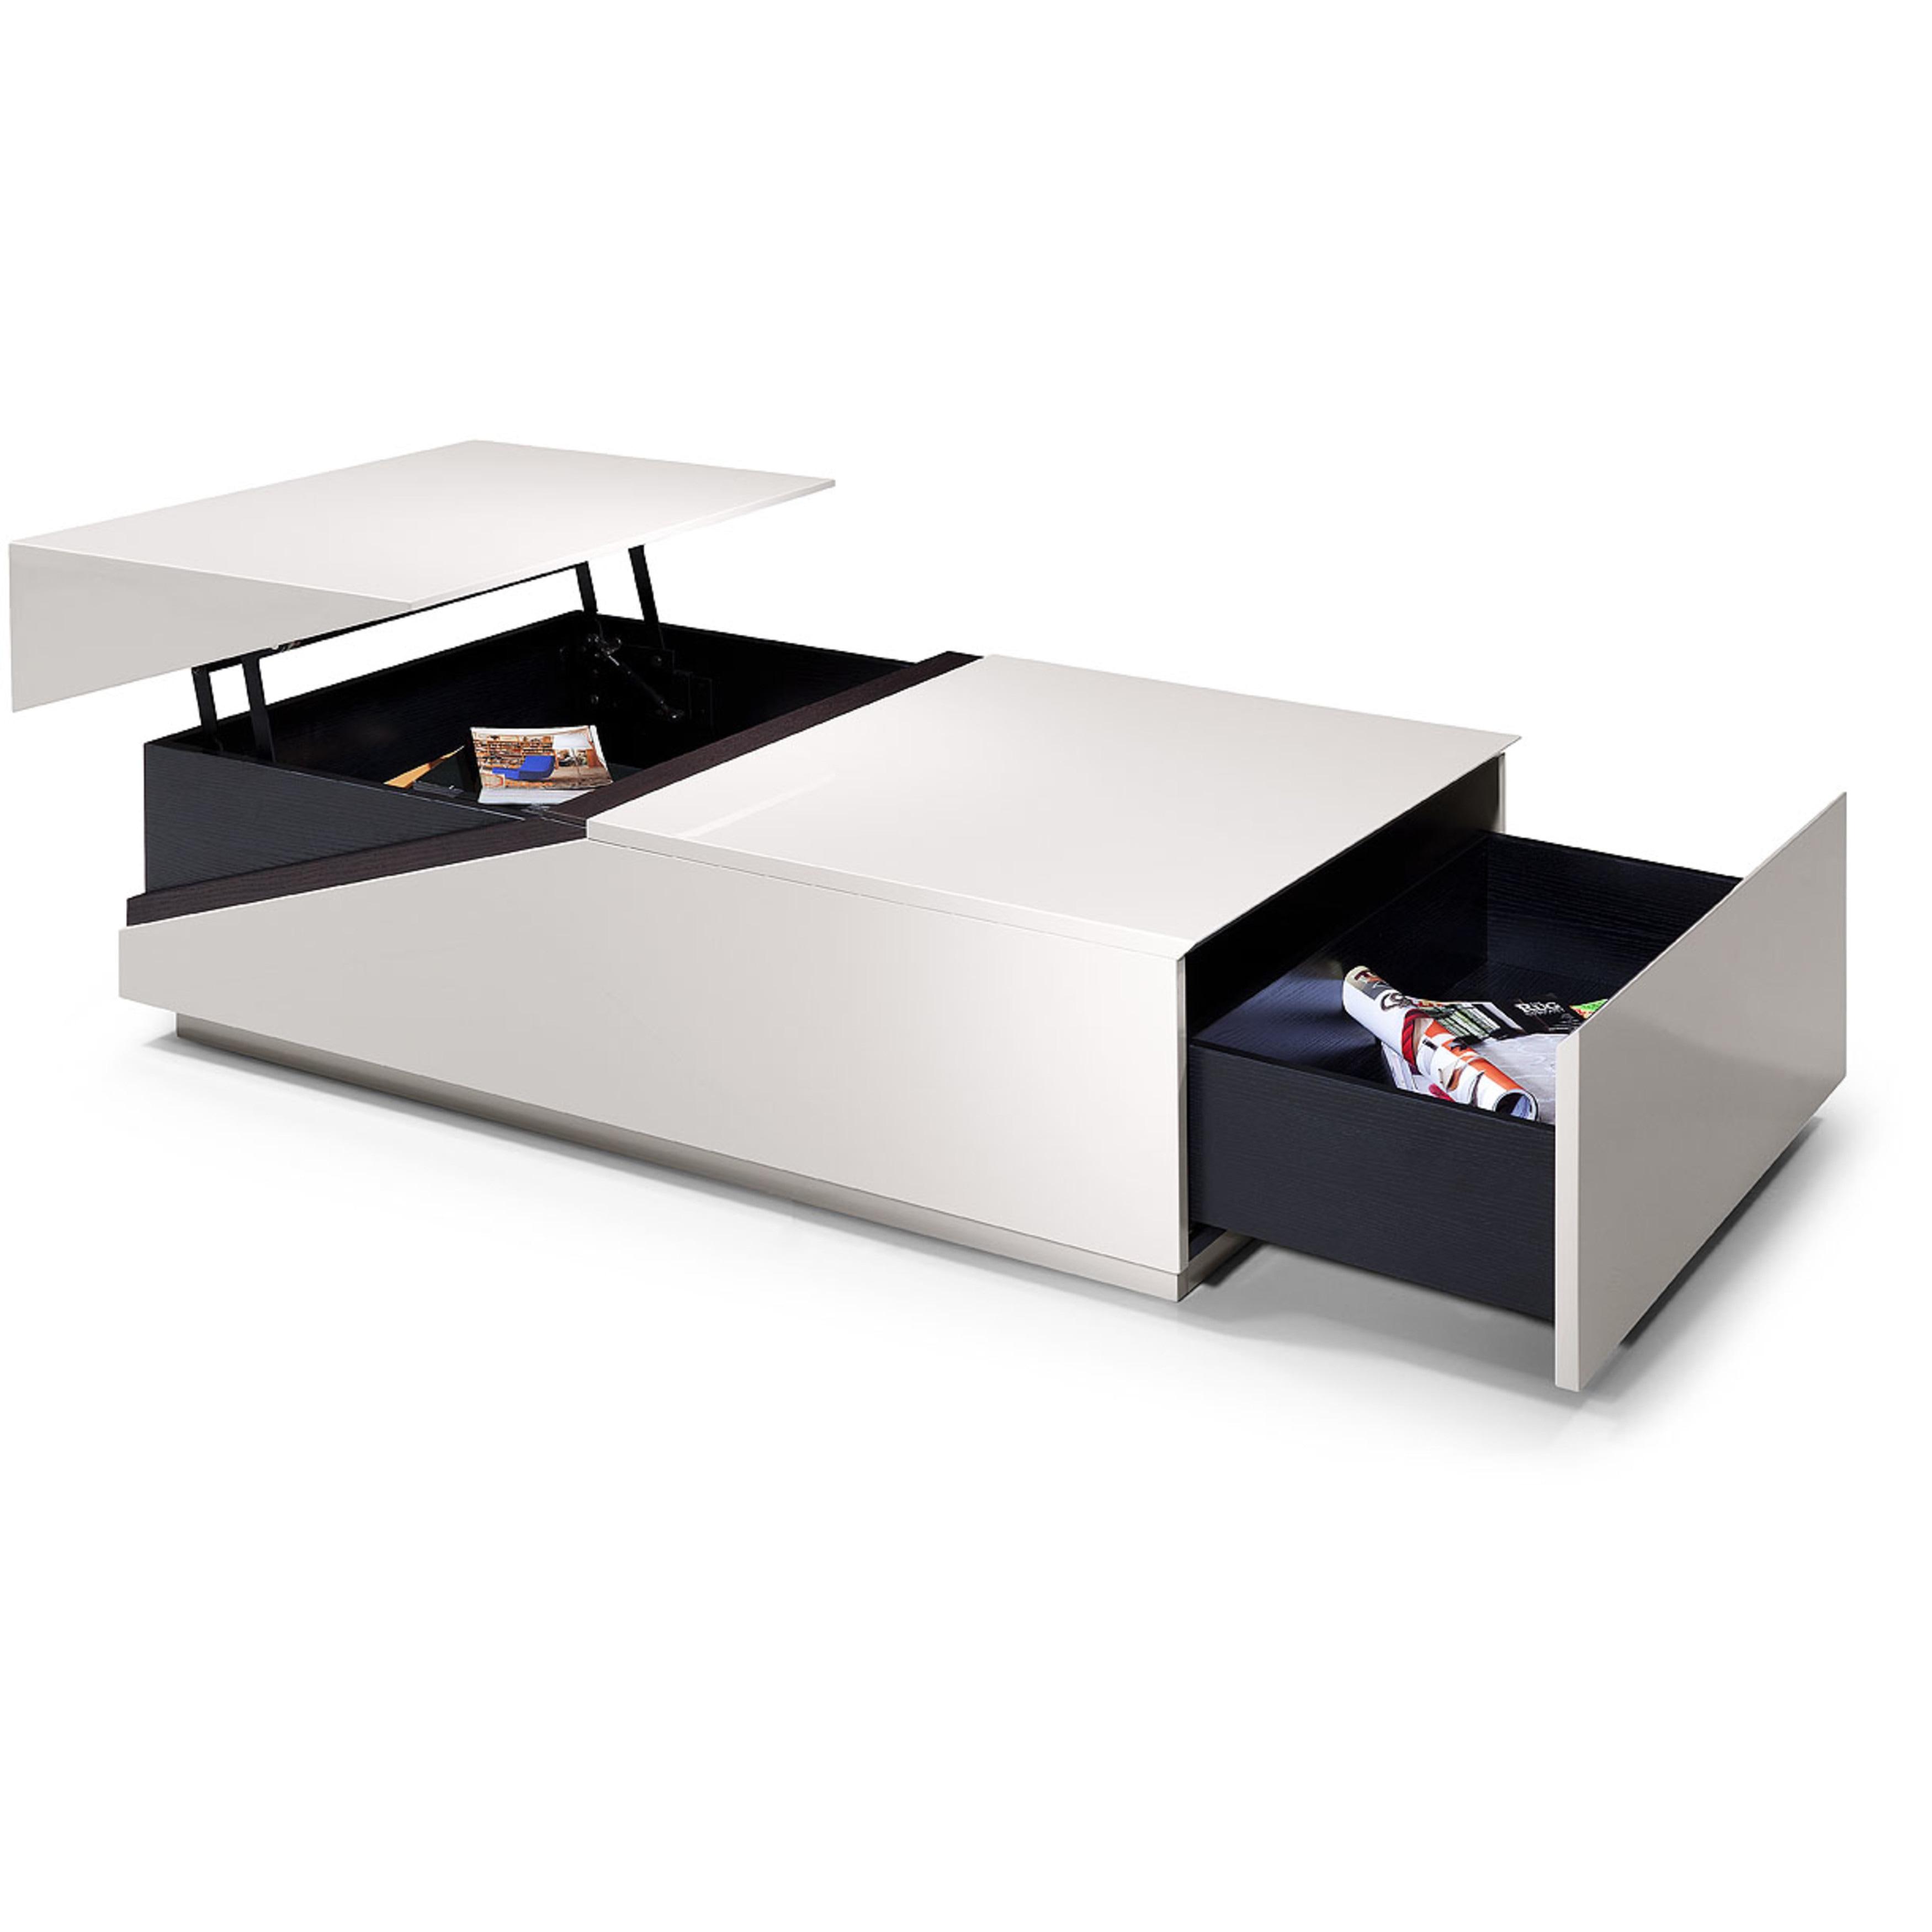 - Shop Modrest SE152A Modern Coffee Table W Storage Compartments